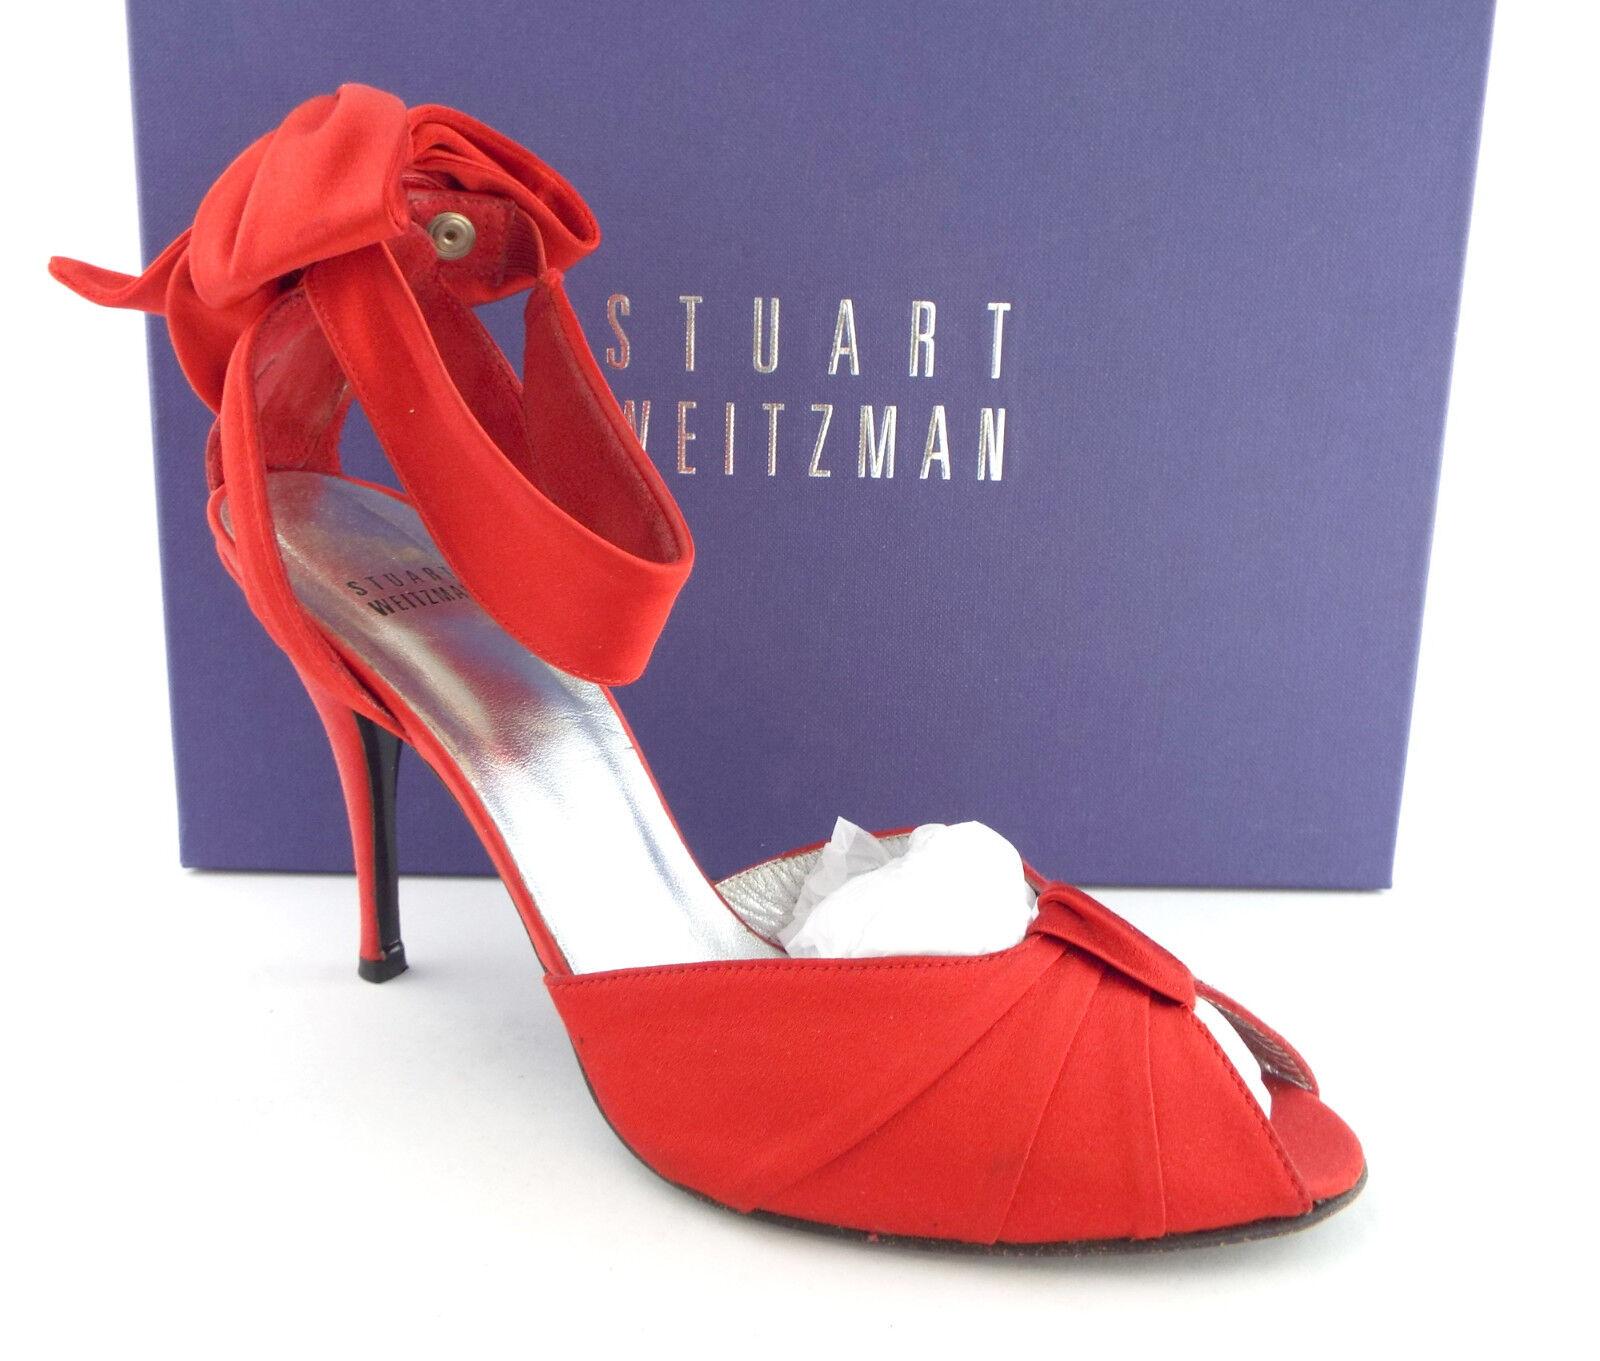 STUART WEITZMAN Größe 8 ROT Satin Open Toe Heels Bow Pumps Schuhes